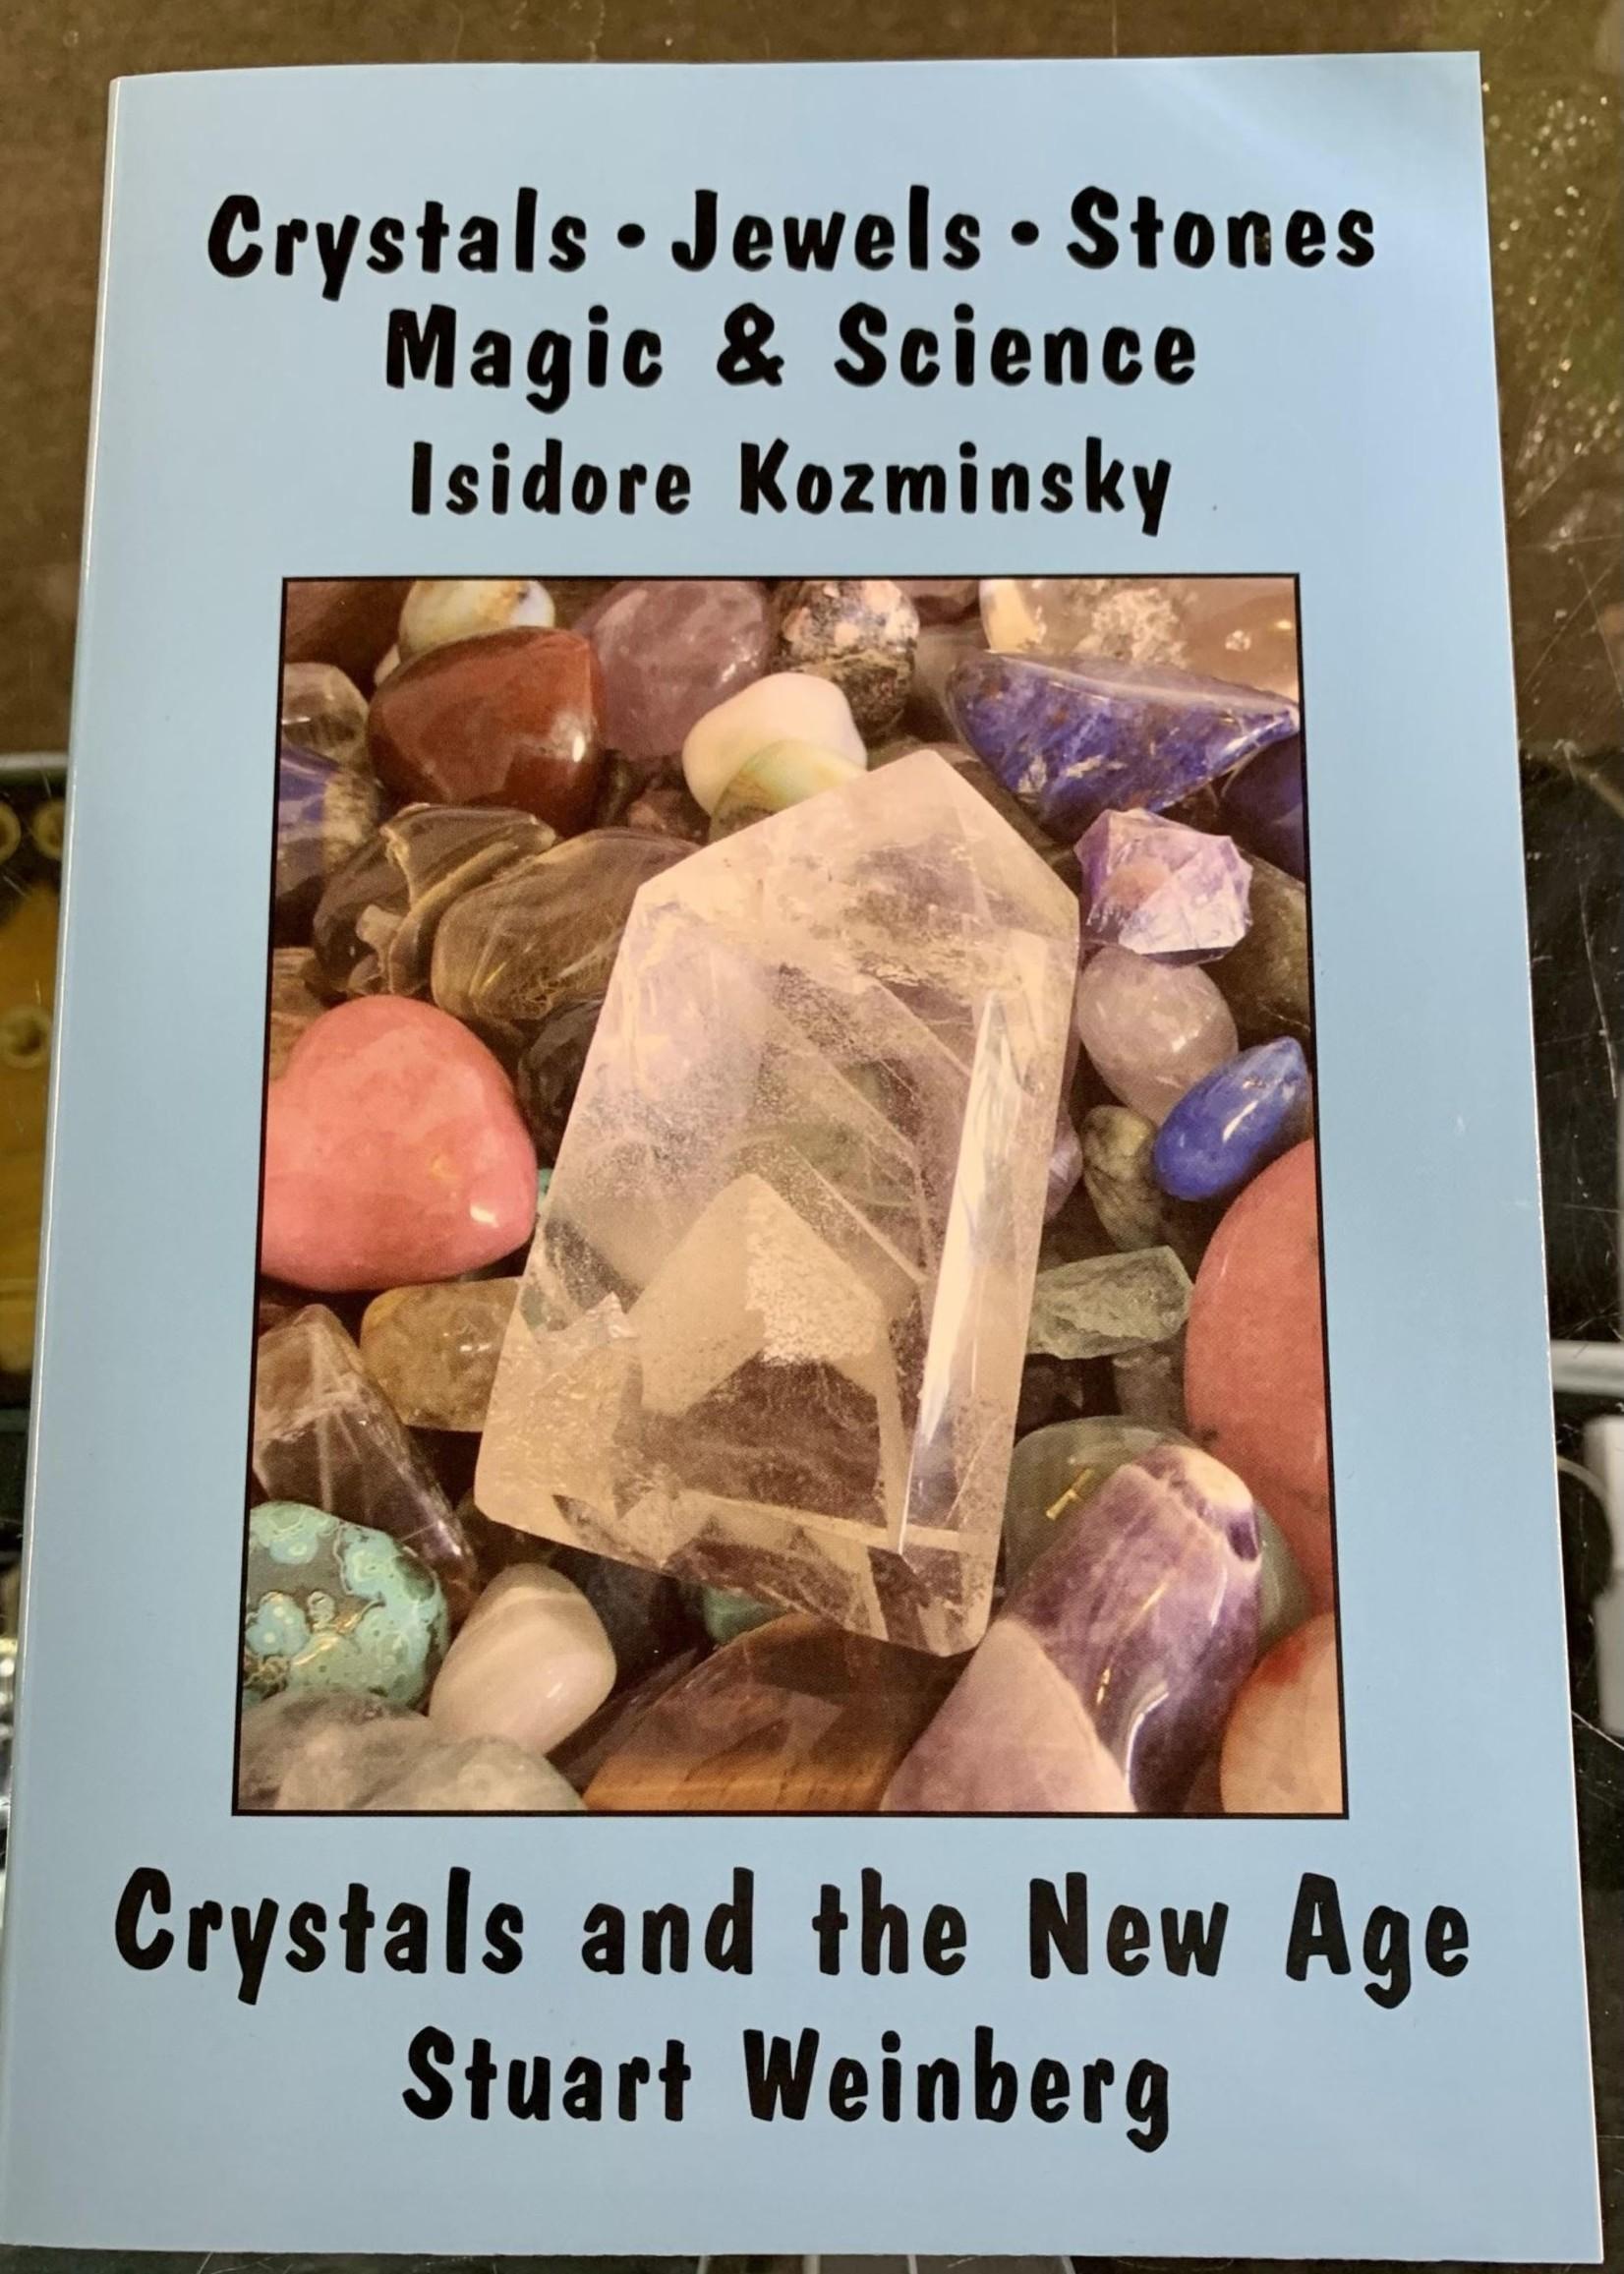 Crystals, Jewels, Stones Magic & Science - Isidore Kozminsky, Preface by Stuart Weinberg